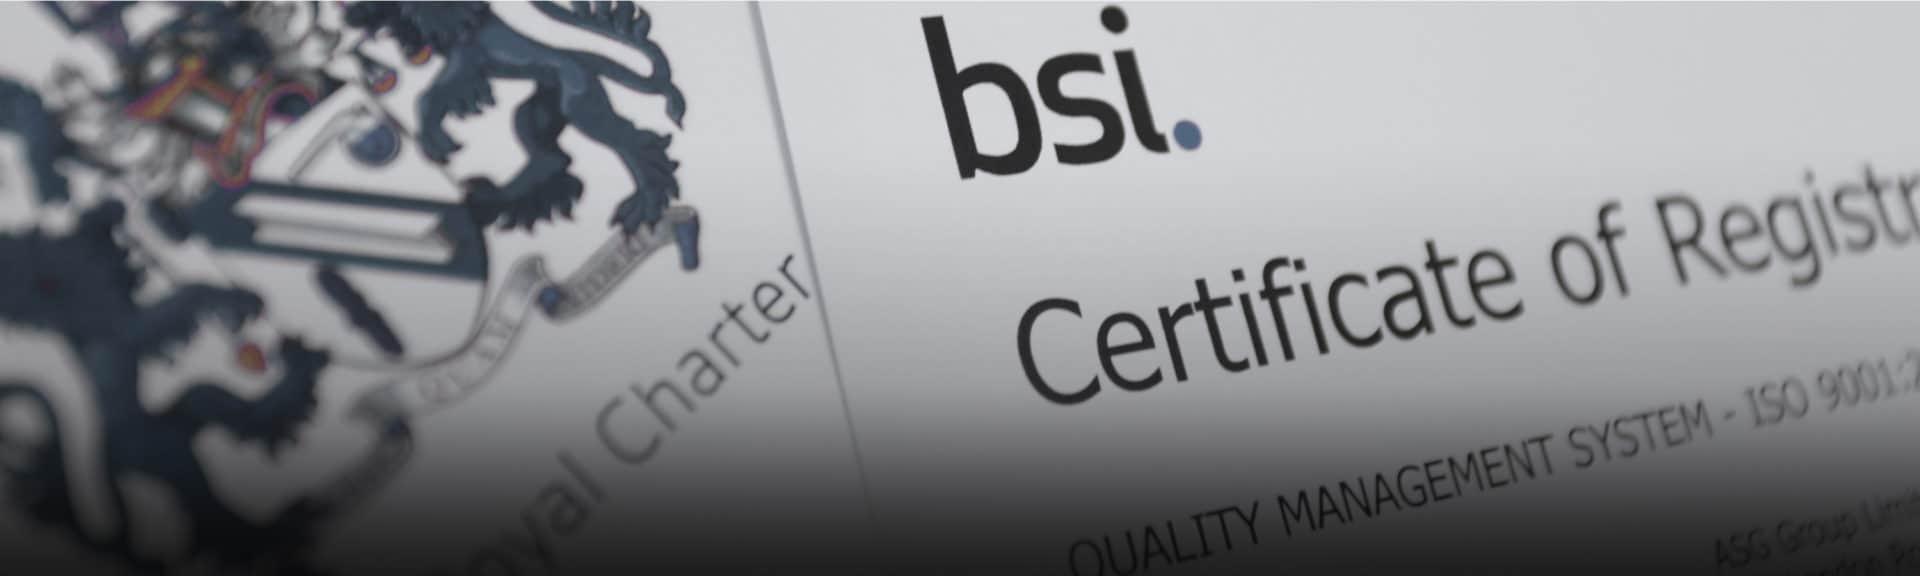 BSI Quality Assurance